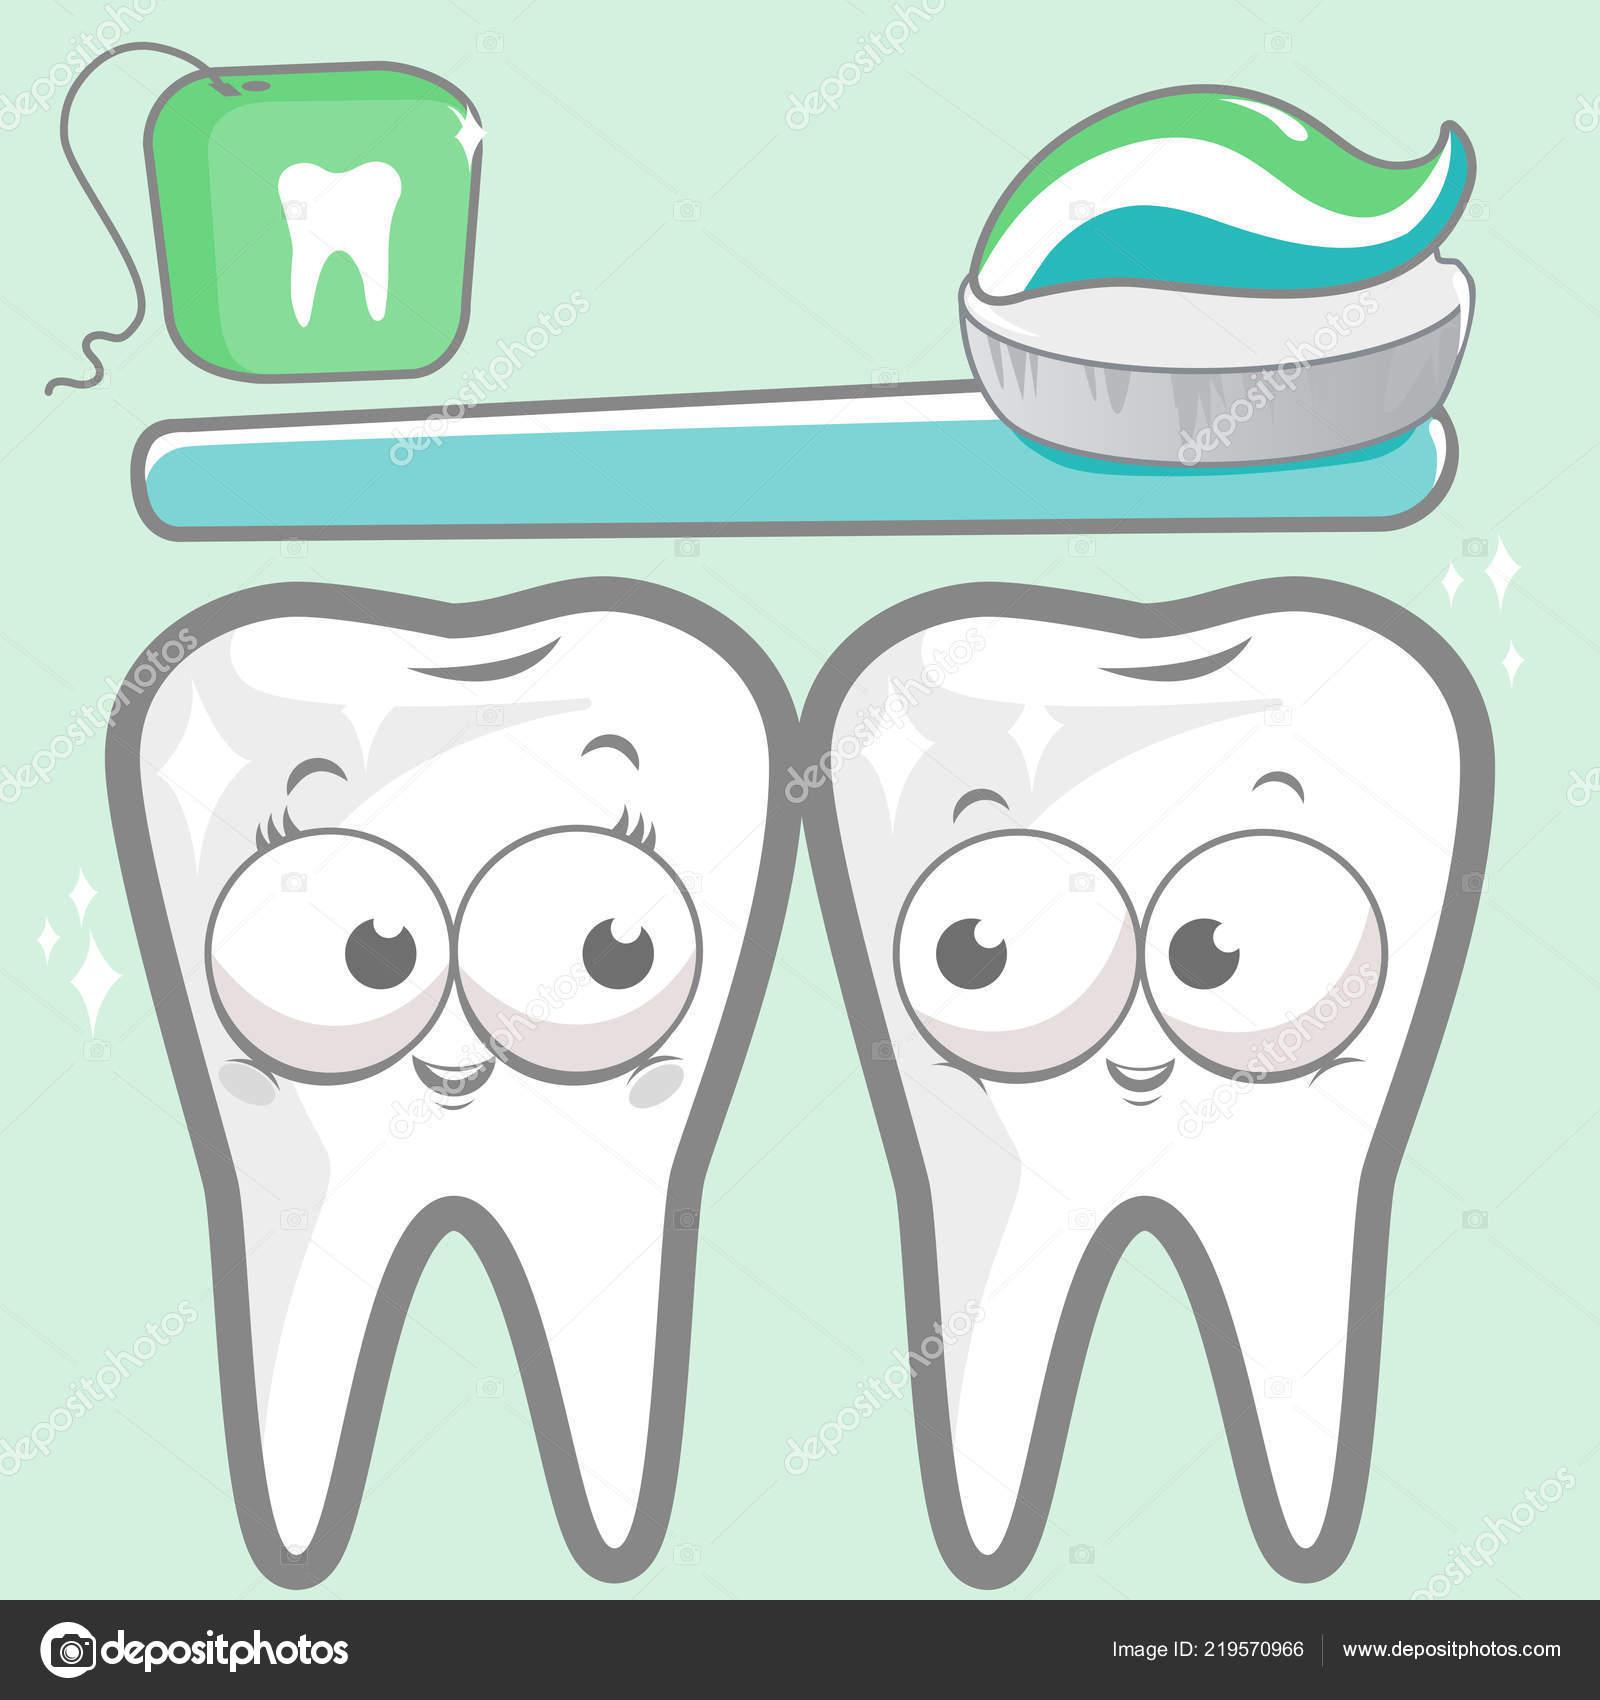 d6ca5ae4f Cartoon Teeth Toothbrush Dental Floss — Stock Vector © stockakia ...